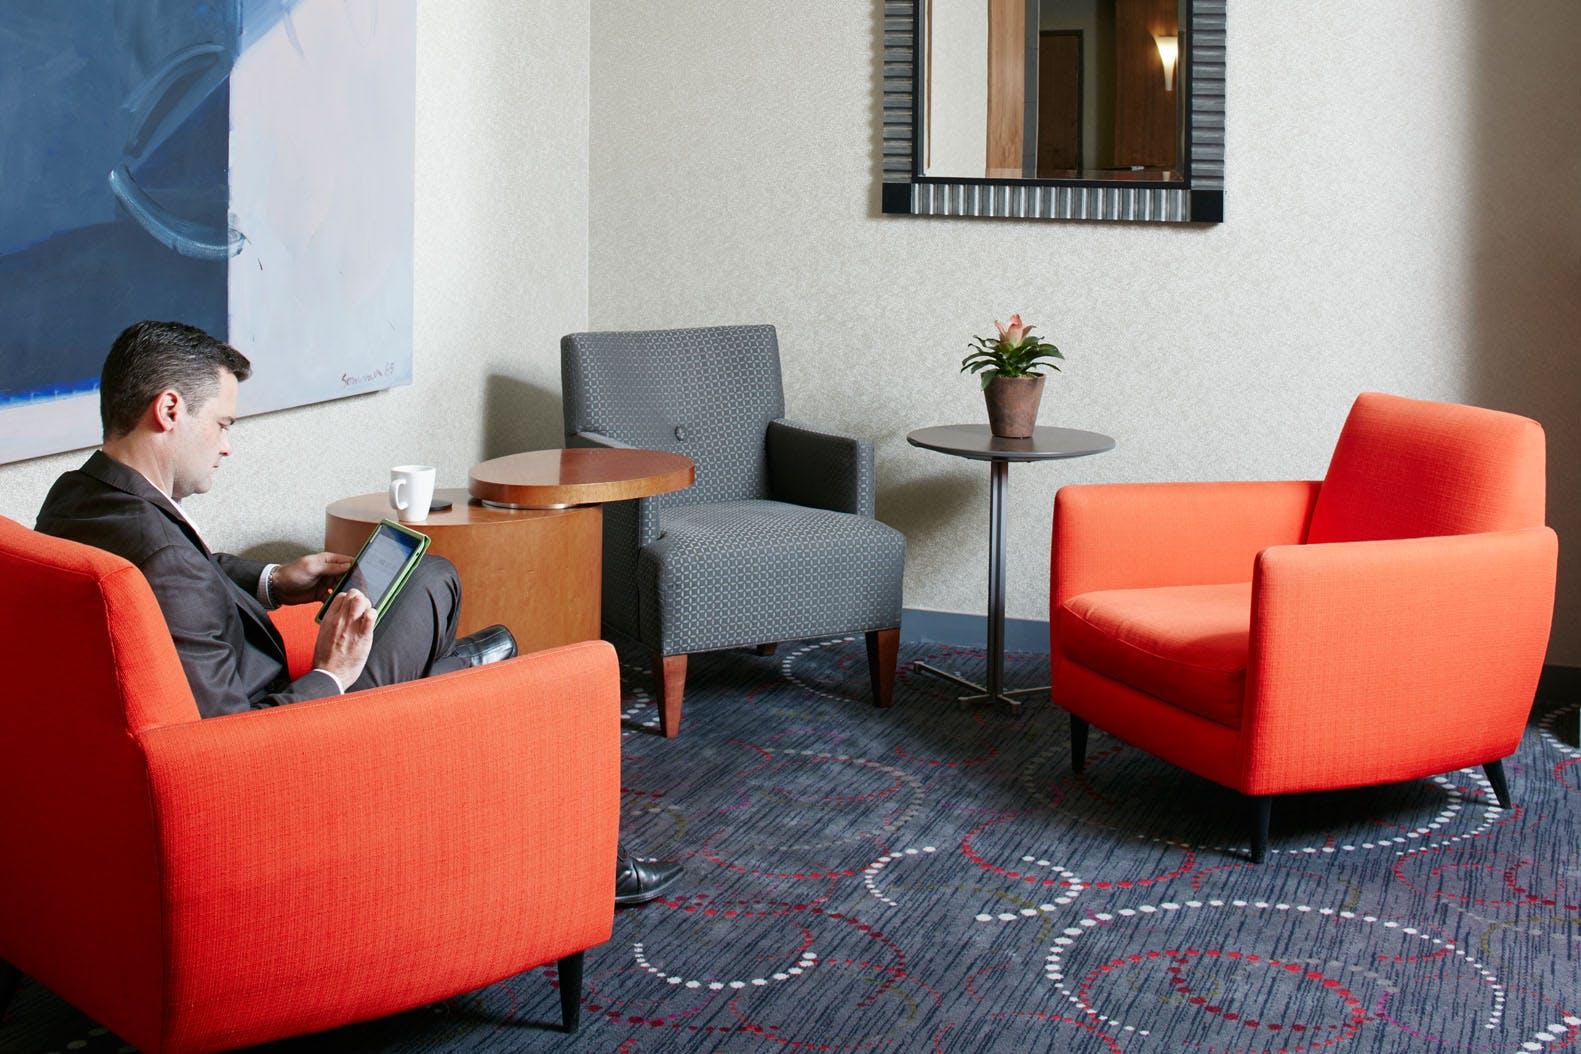 Club Living Room at Club Quarters Hotel in San Francisco